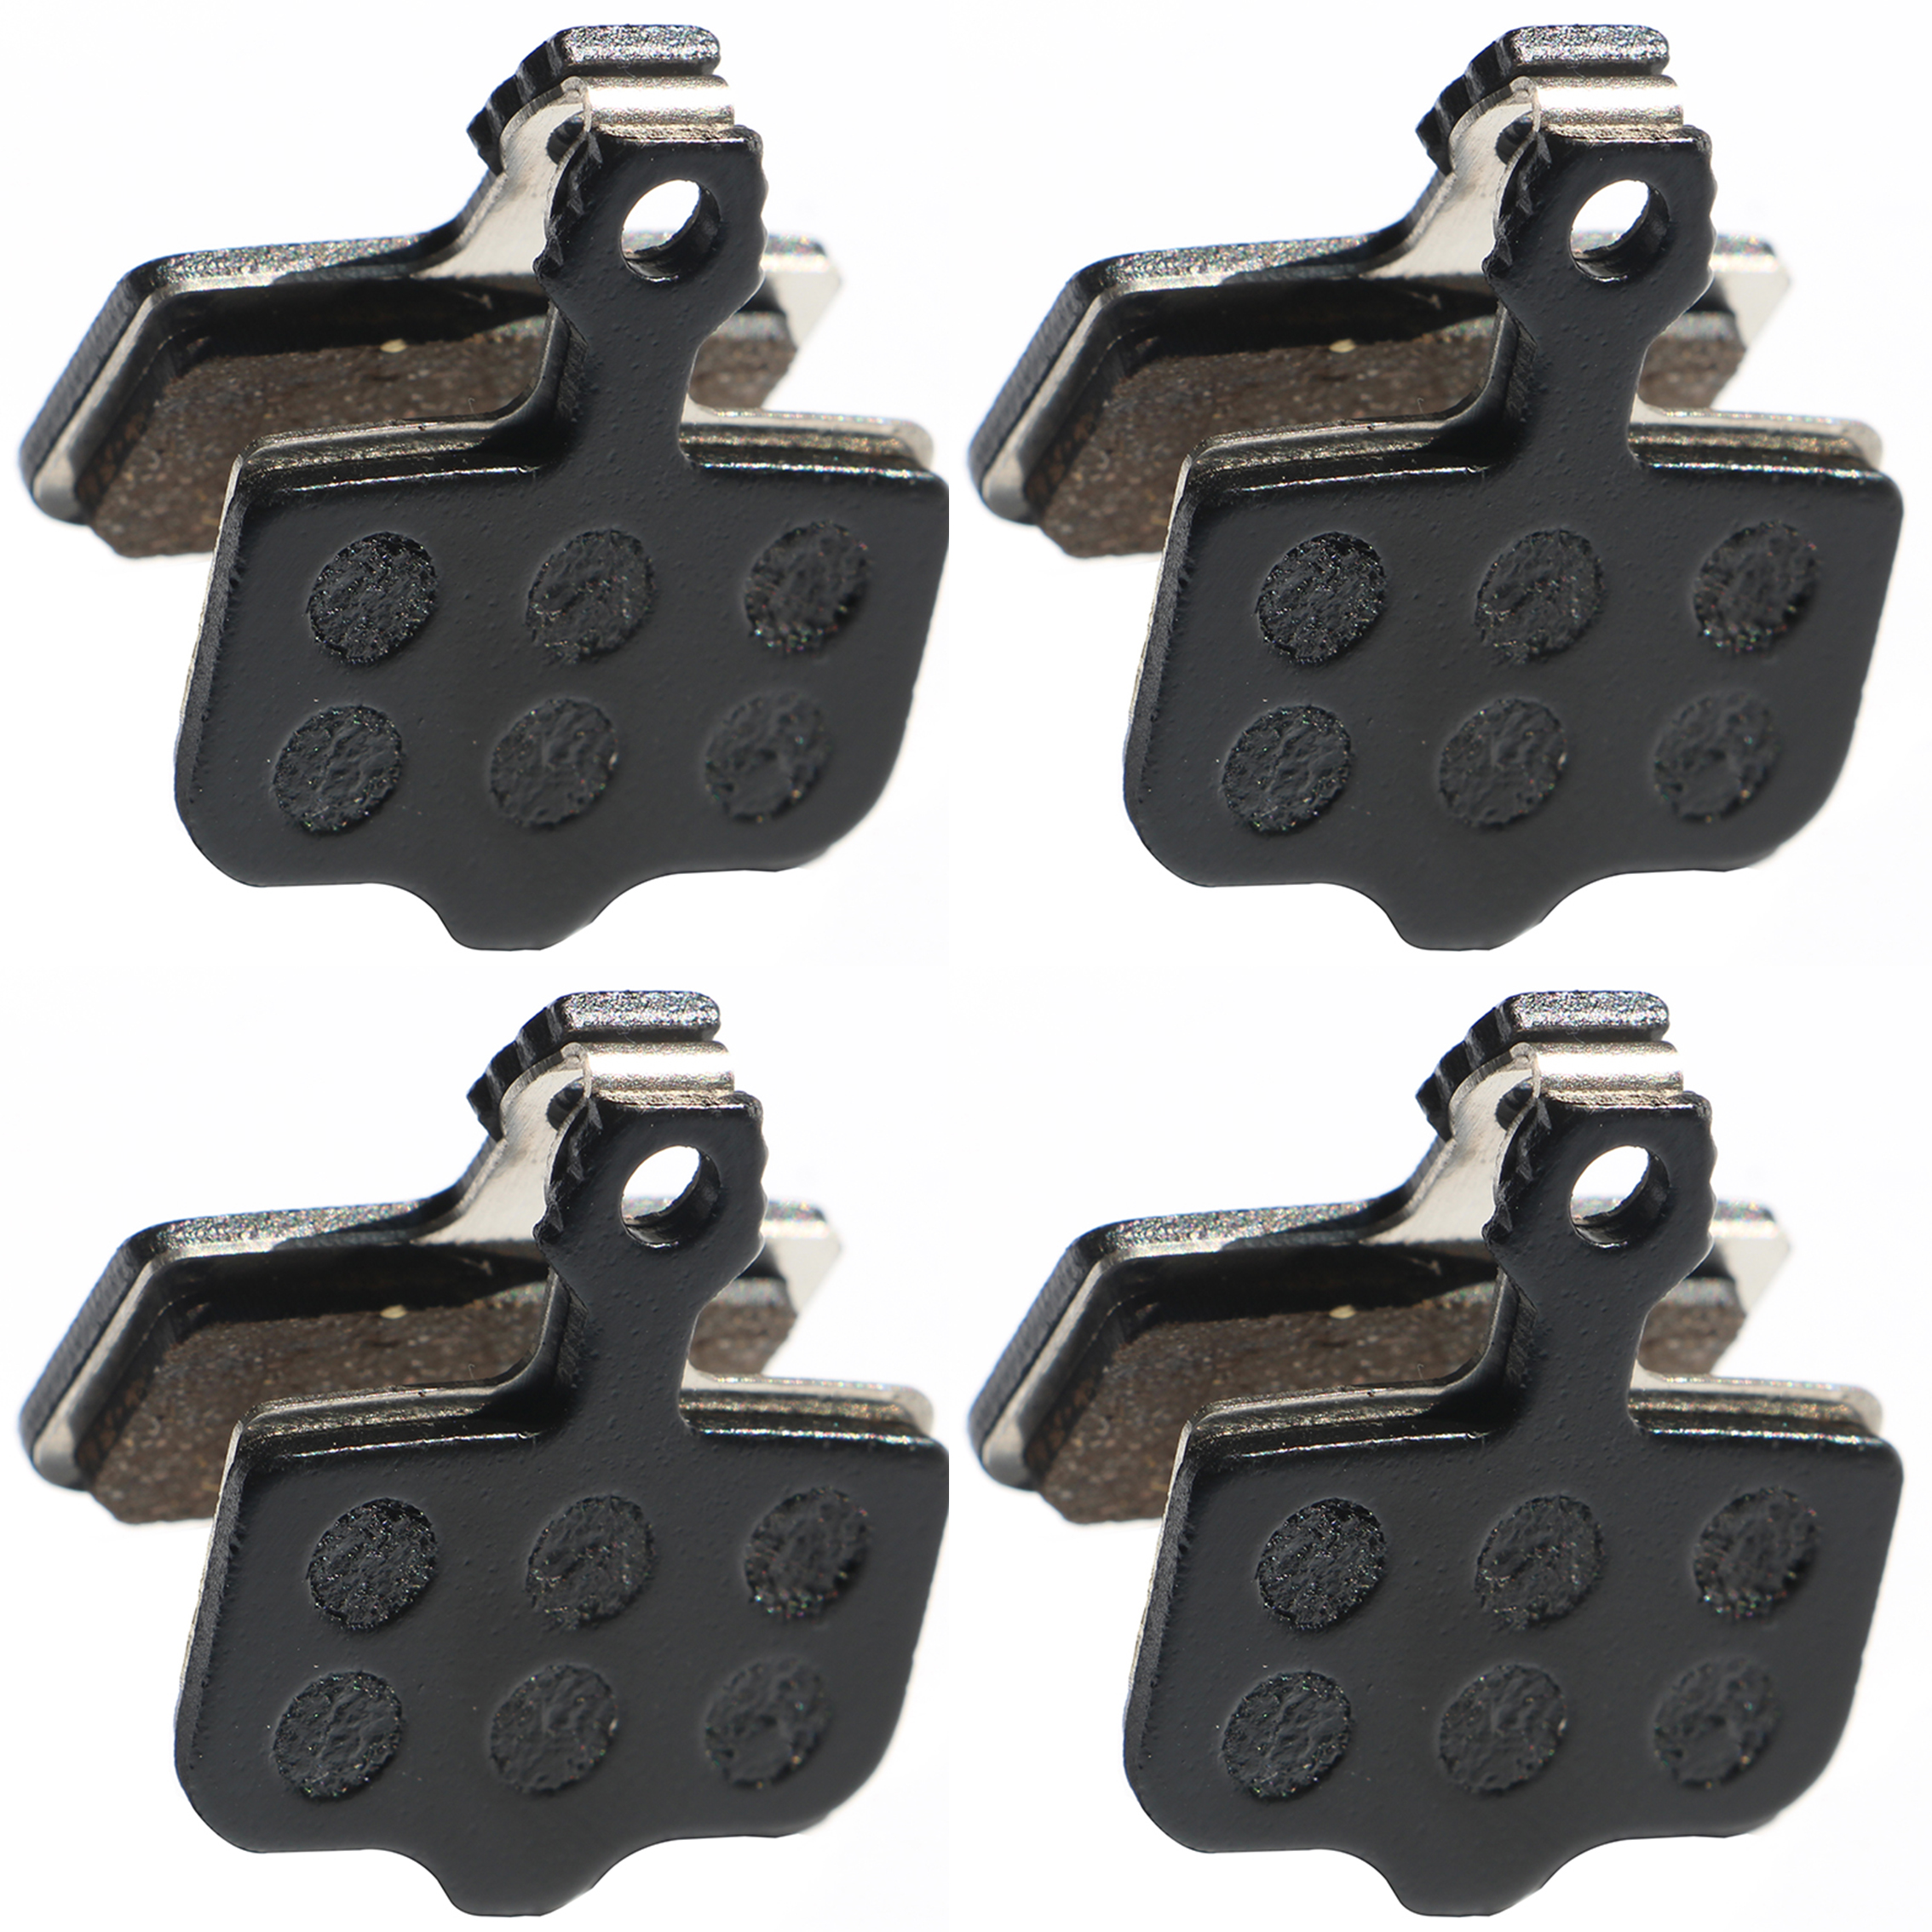 4 Pairs bicycle disc brake pads for shimeno 375 395 486 485 475 416 446 515 445 525 for tektro Orion / Auriga Pro / Gemini